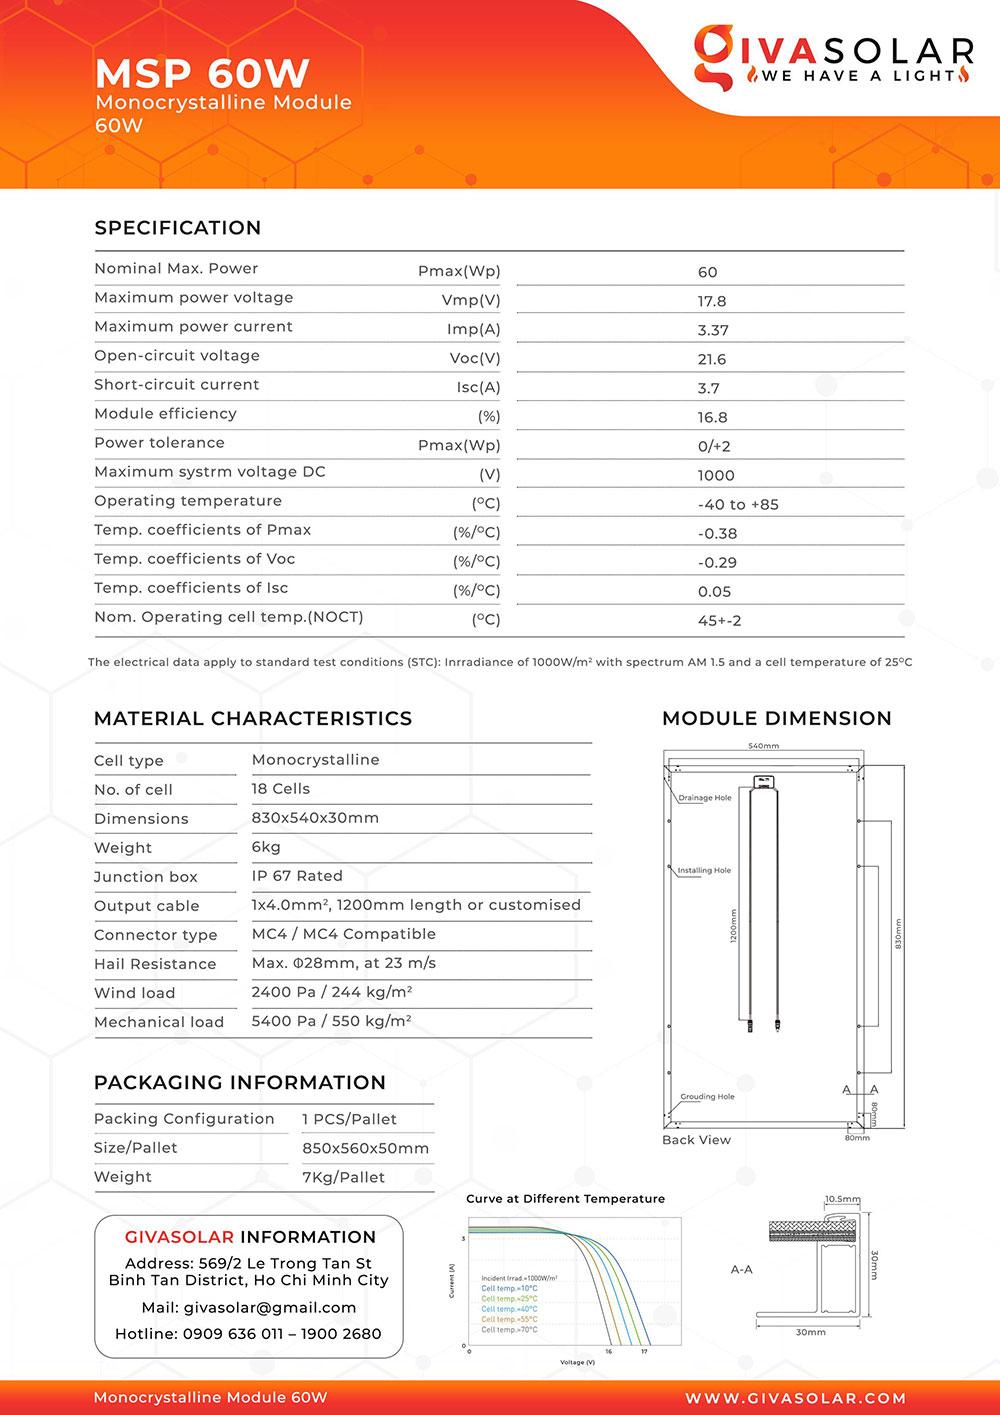 Mono MSP-60W Solar panel brochure 2